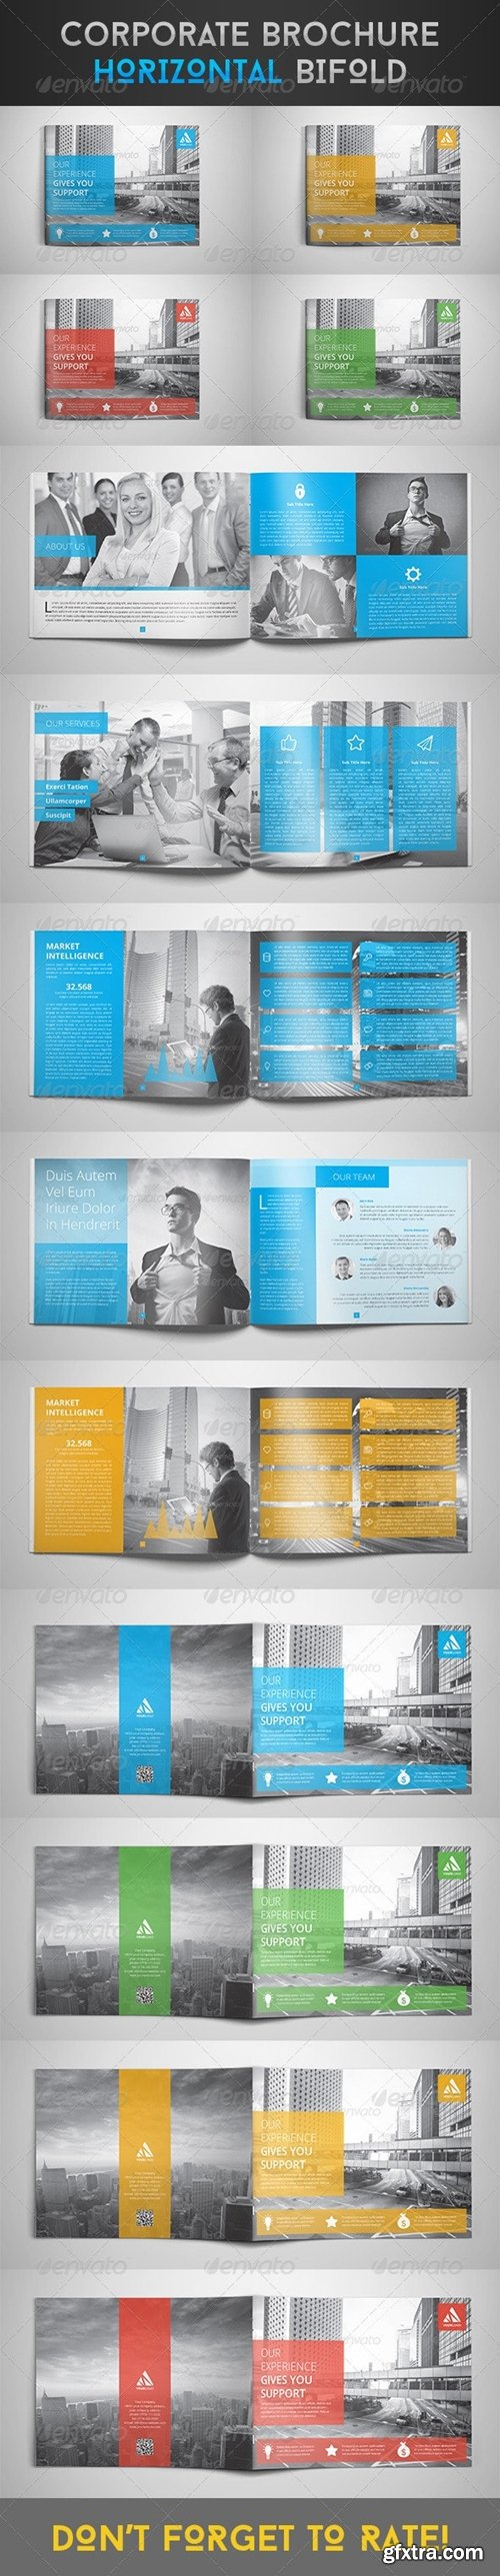 GraphicRiver - Corporate Brochure - Horizontal Bi-Fold 8124753